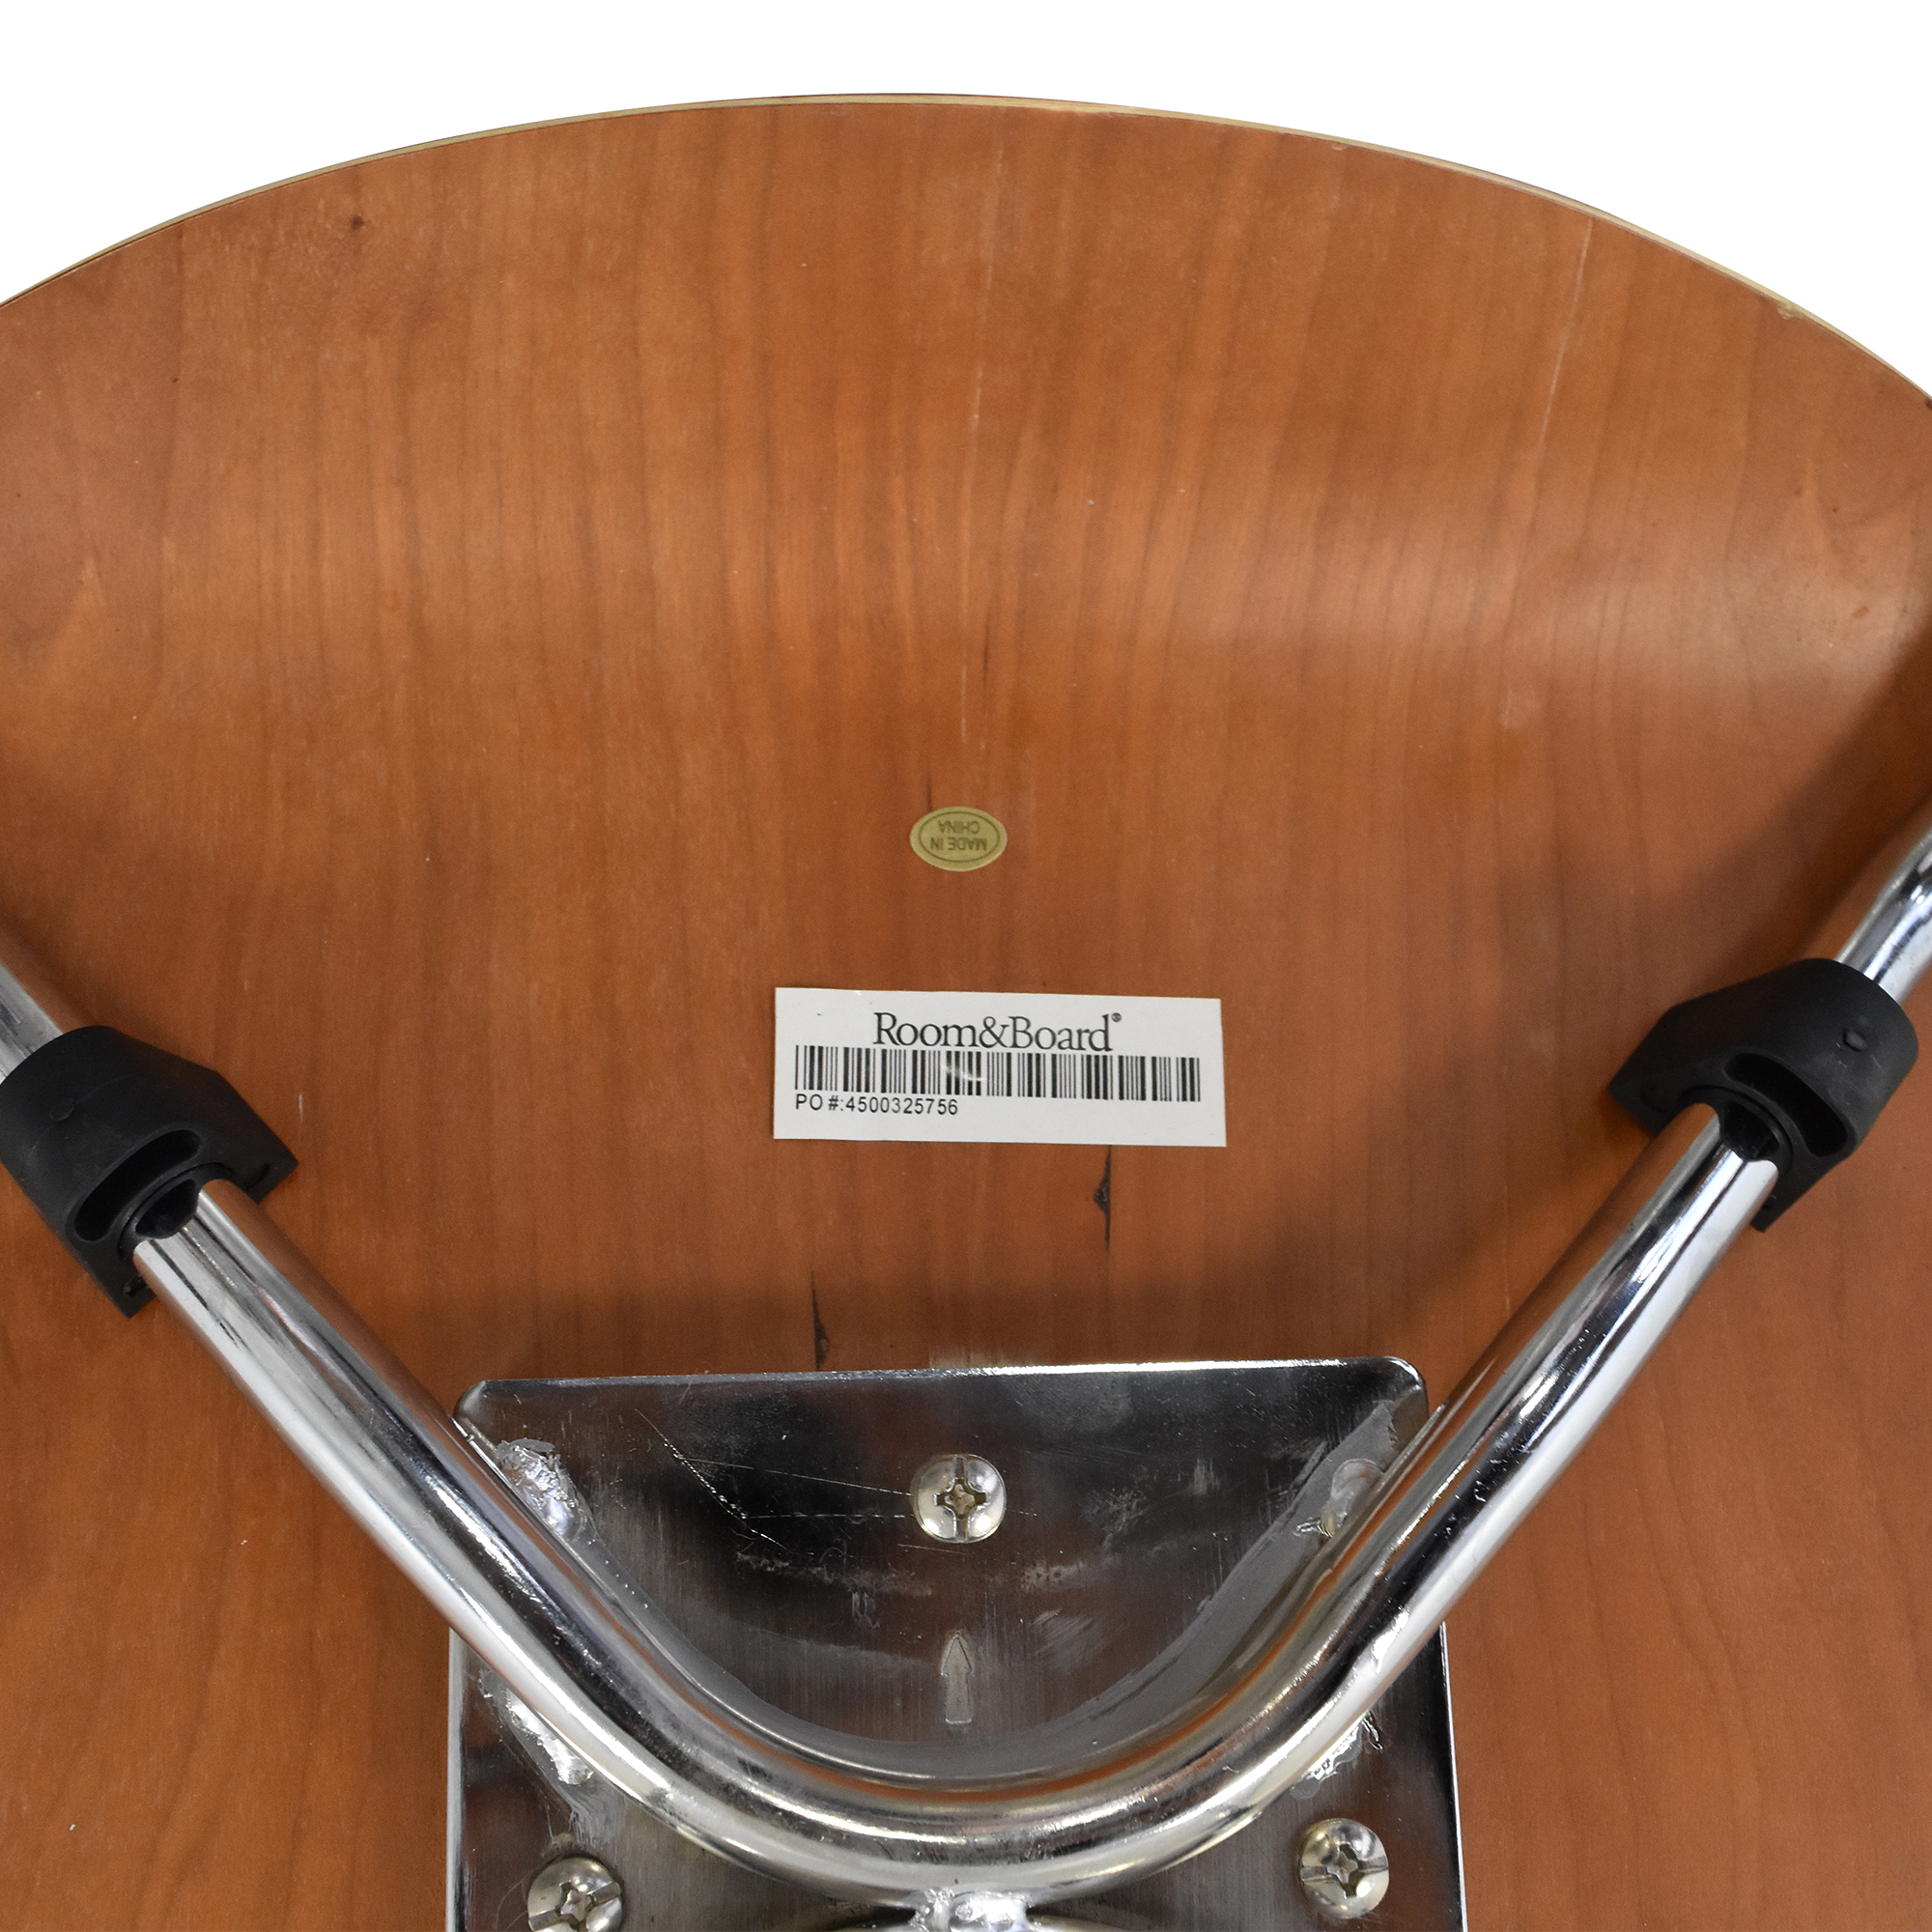 Room & Board Room & Board Jake Dining Chairs nyc